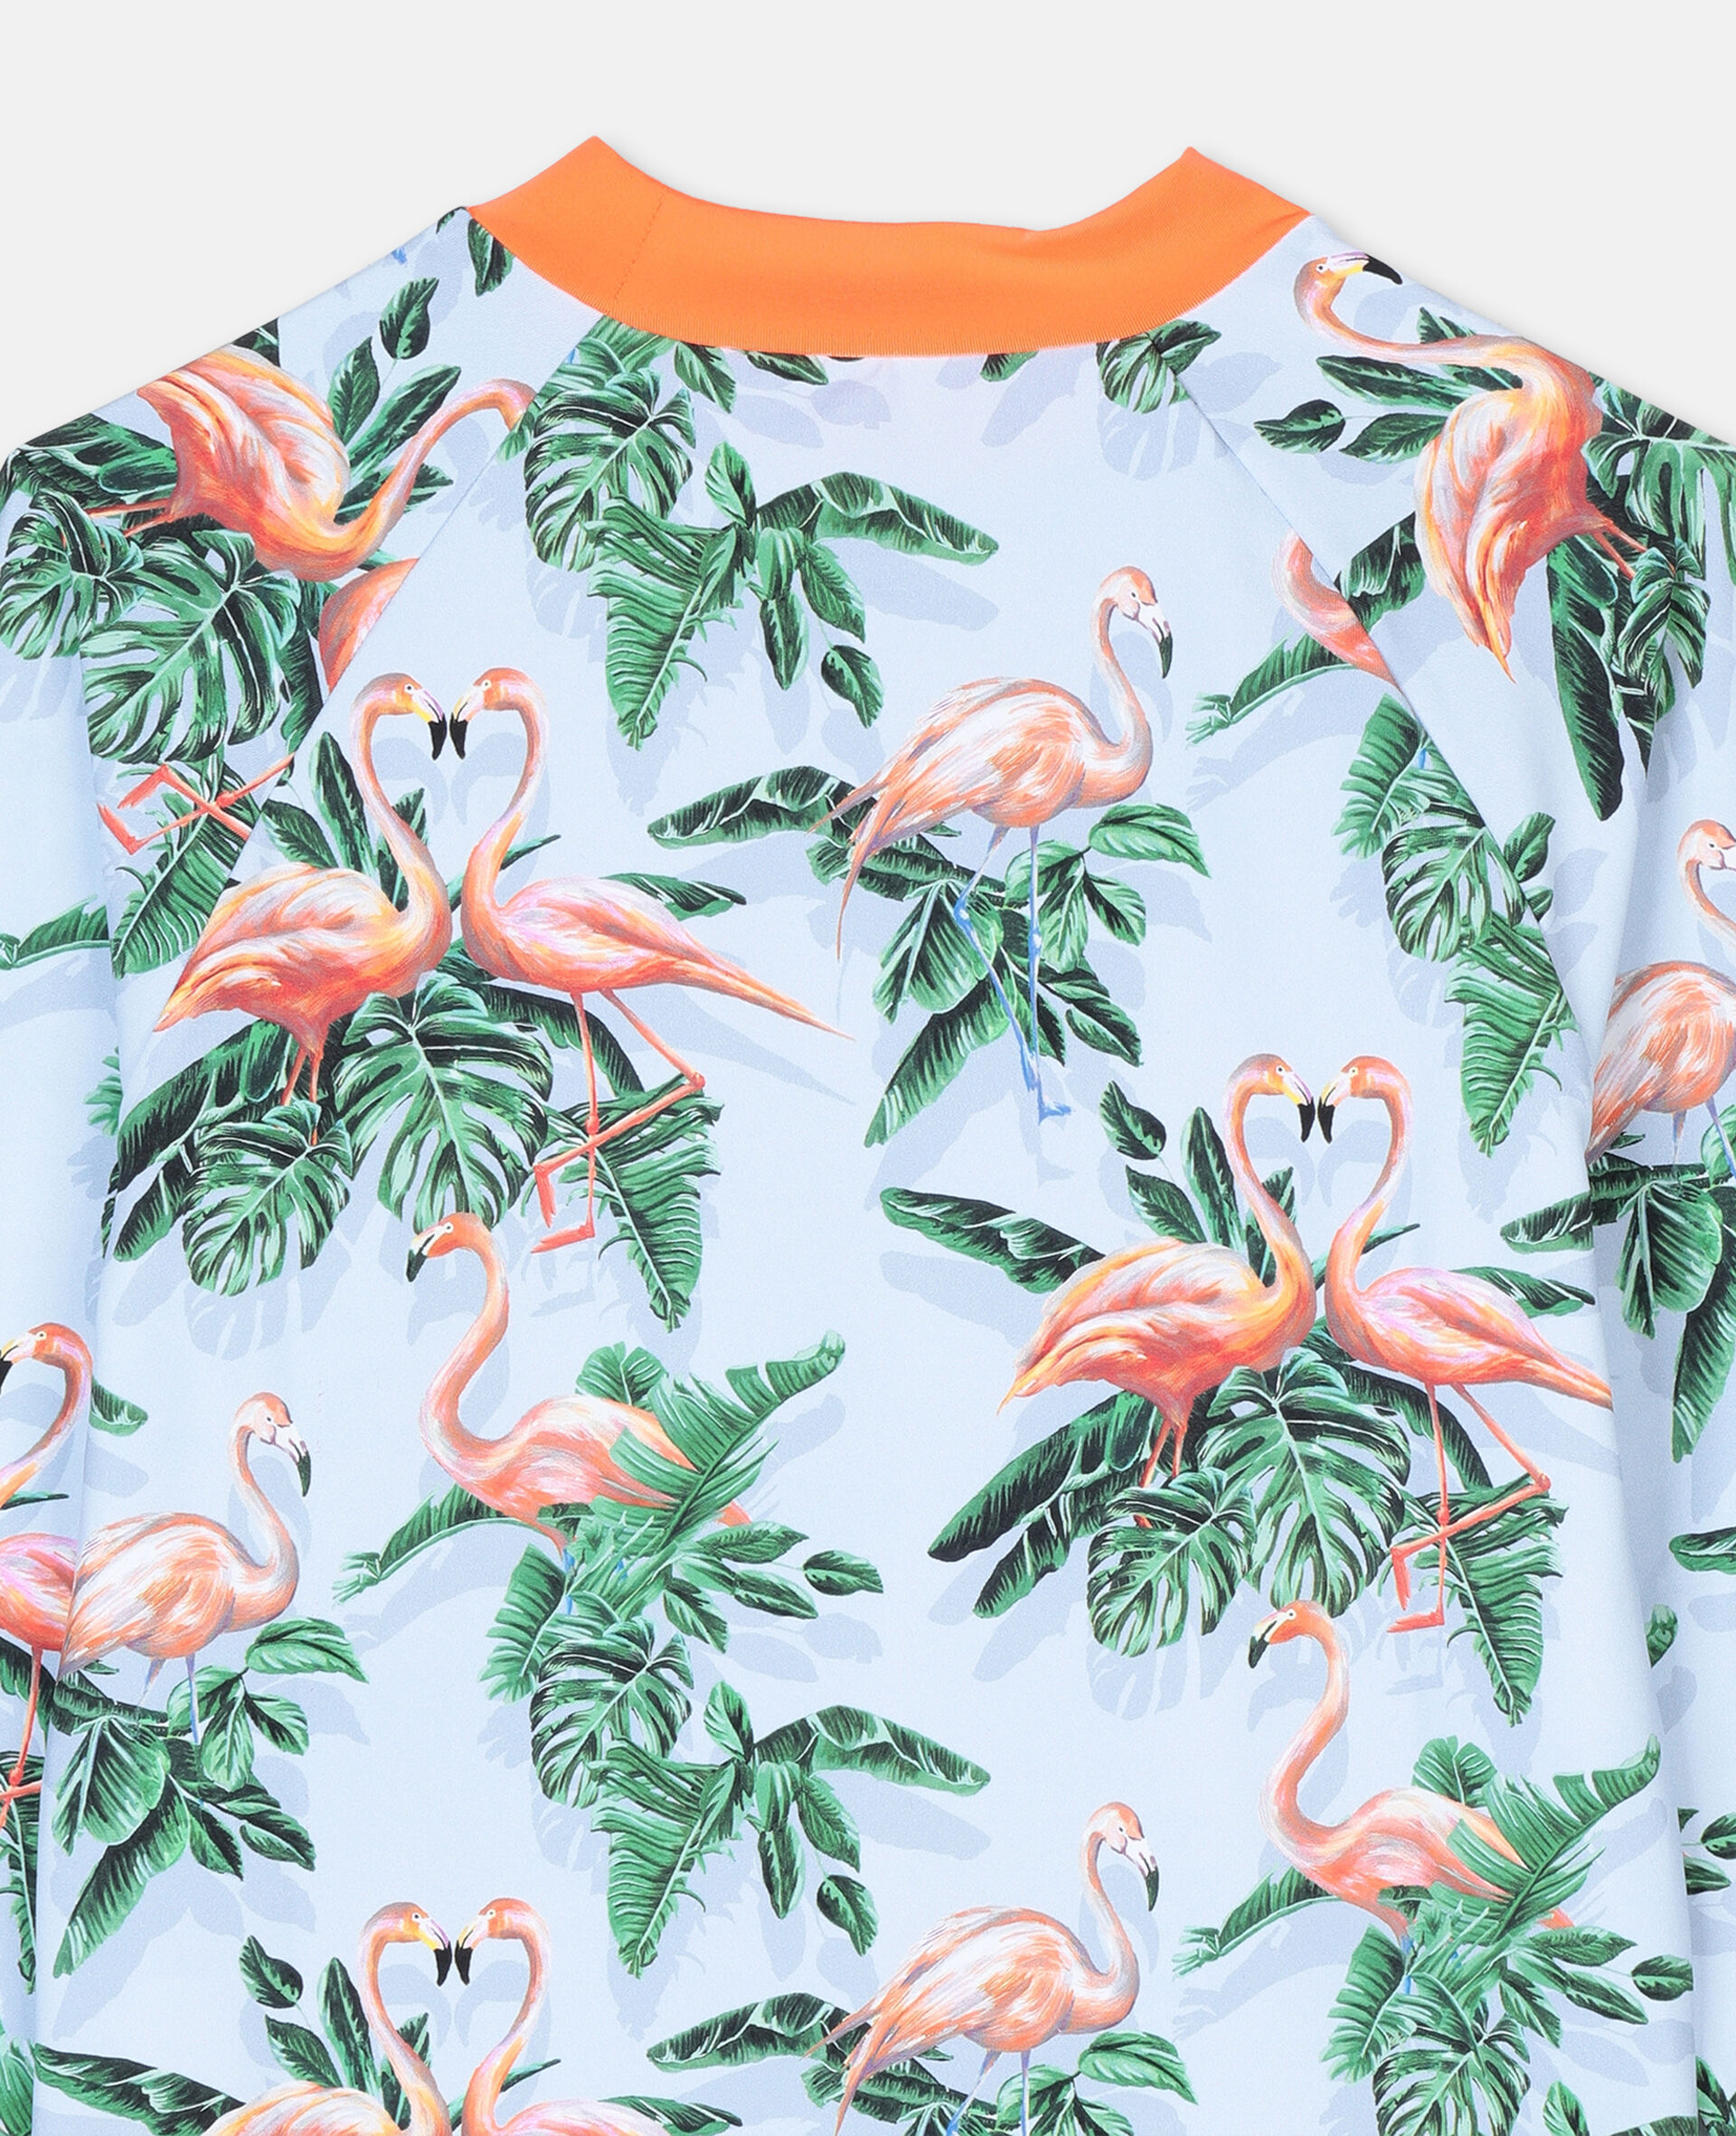 Painty Flamingo游泳T恤 -绿色-large image number 2